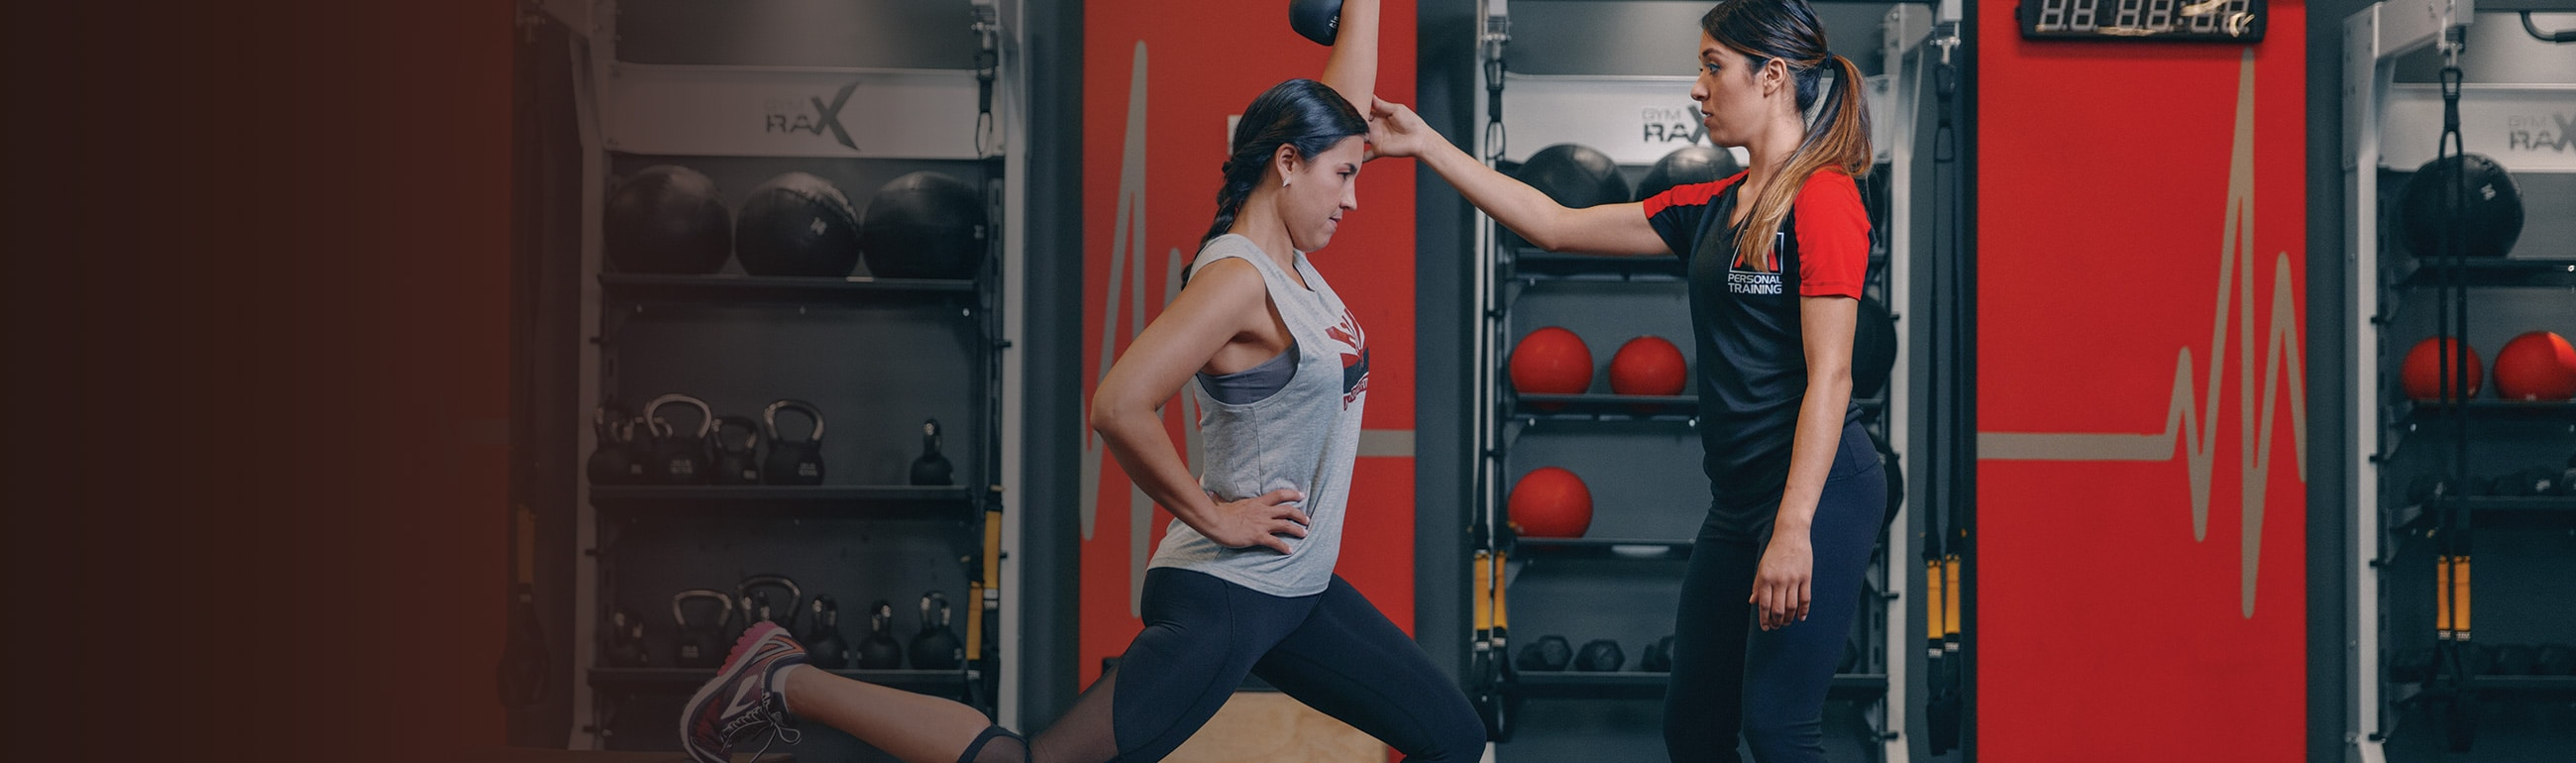 Personal Training Program | Mountainside Fitness – Phoenix, AZ